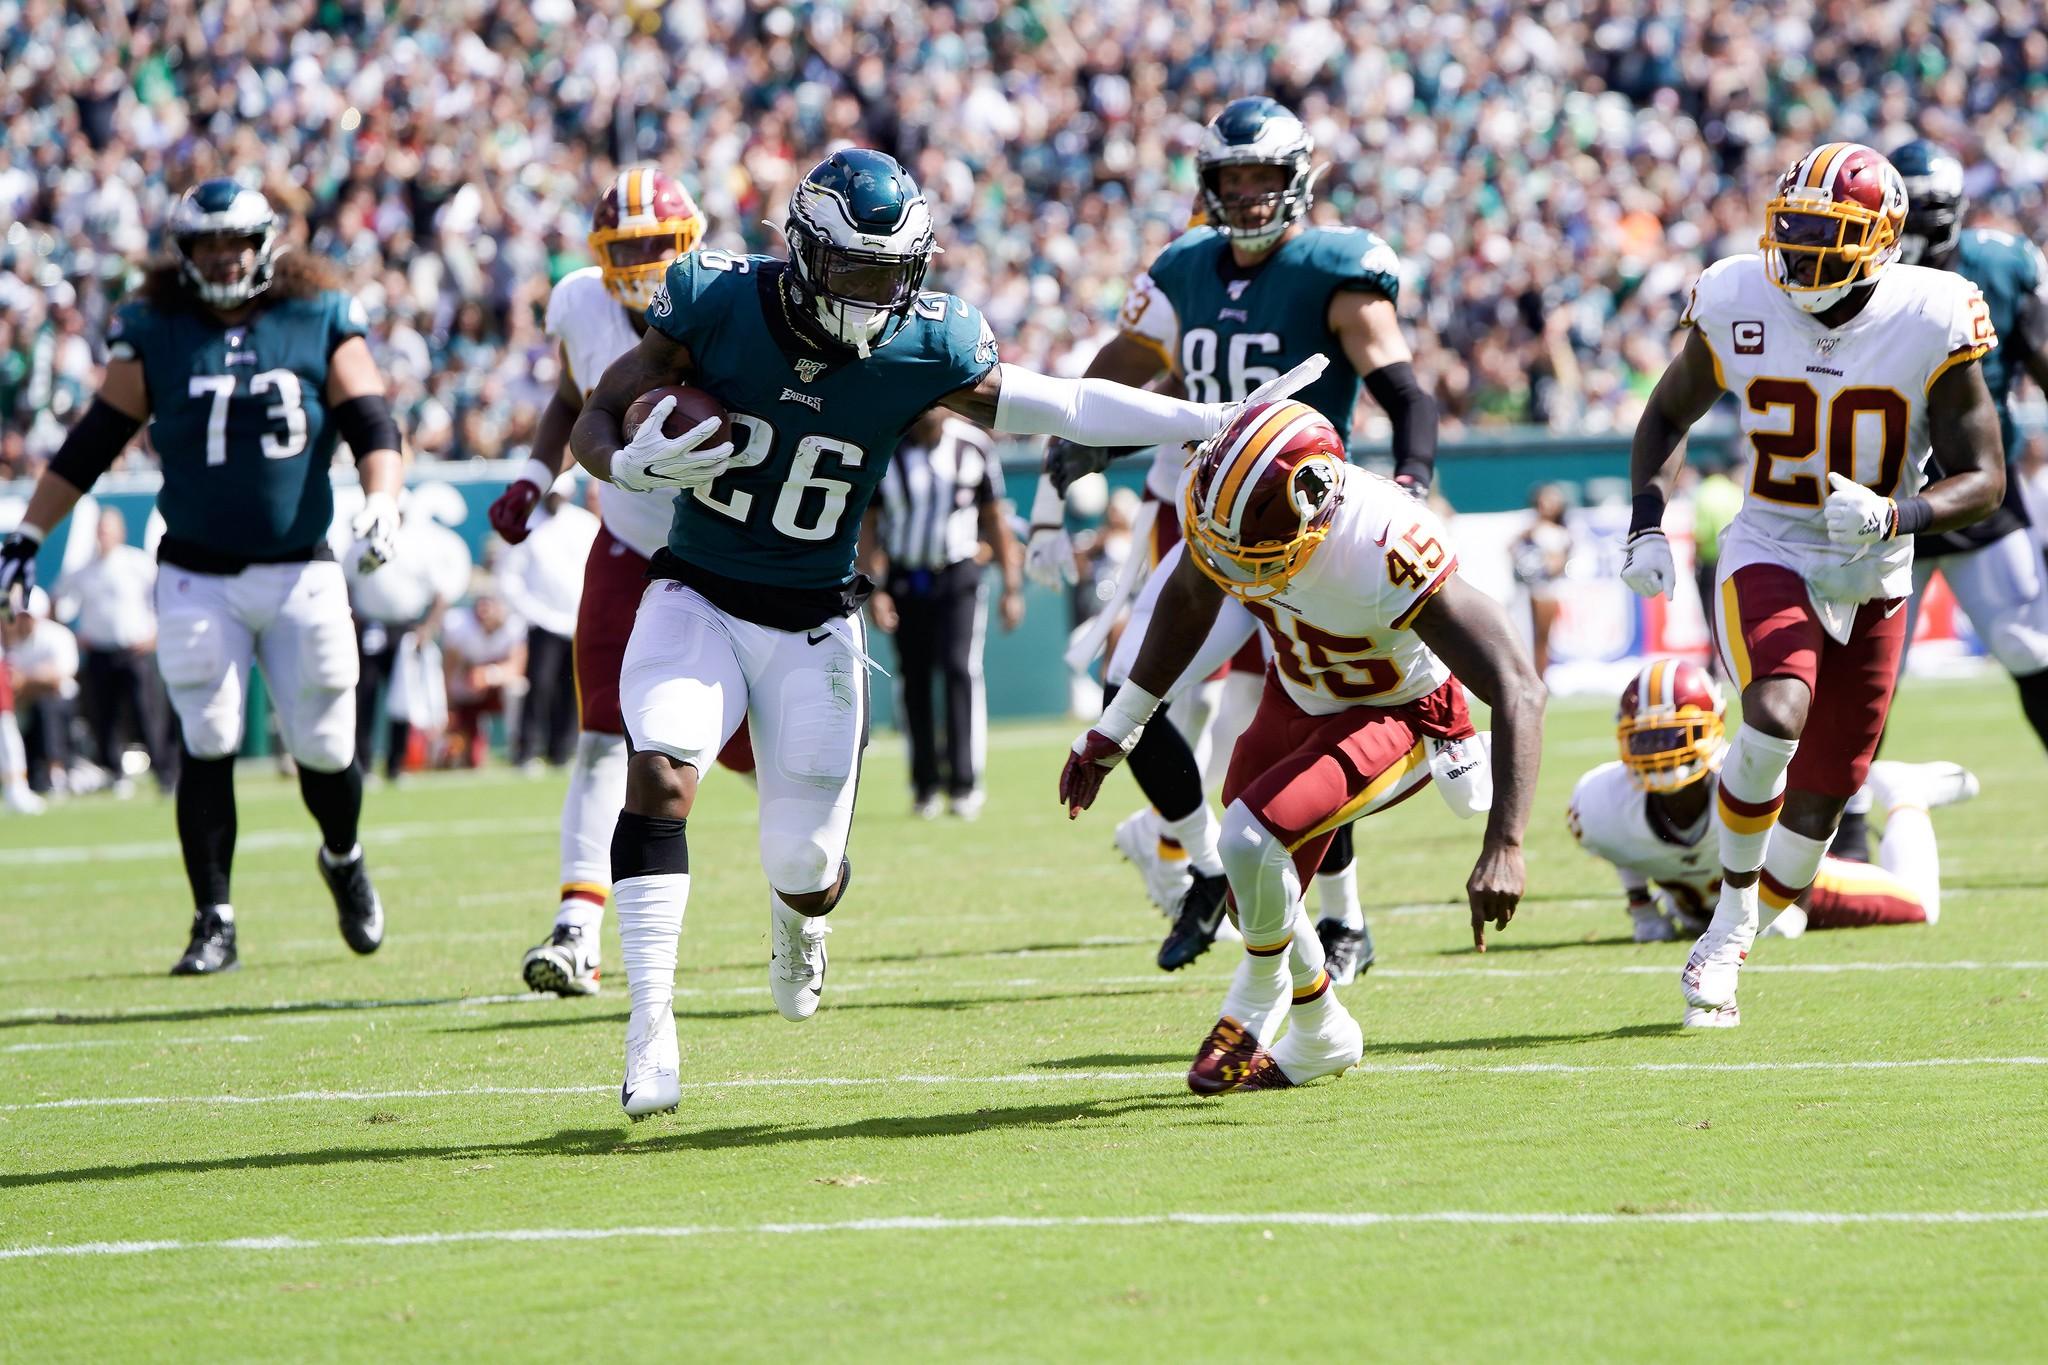 Redskins, Eagles Face Off in Week 1 of 2019 NFL Season 📸